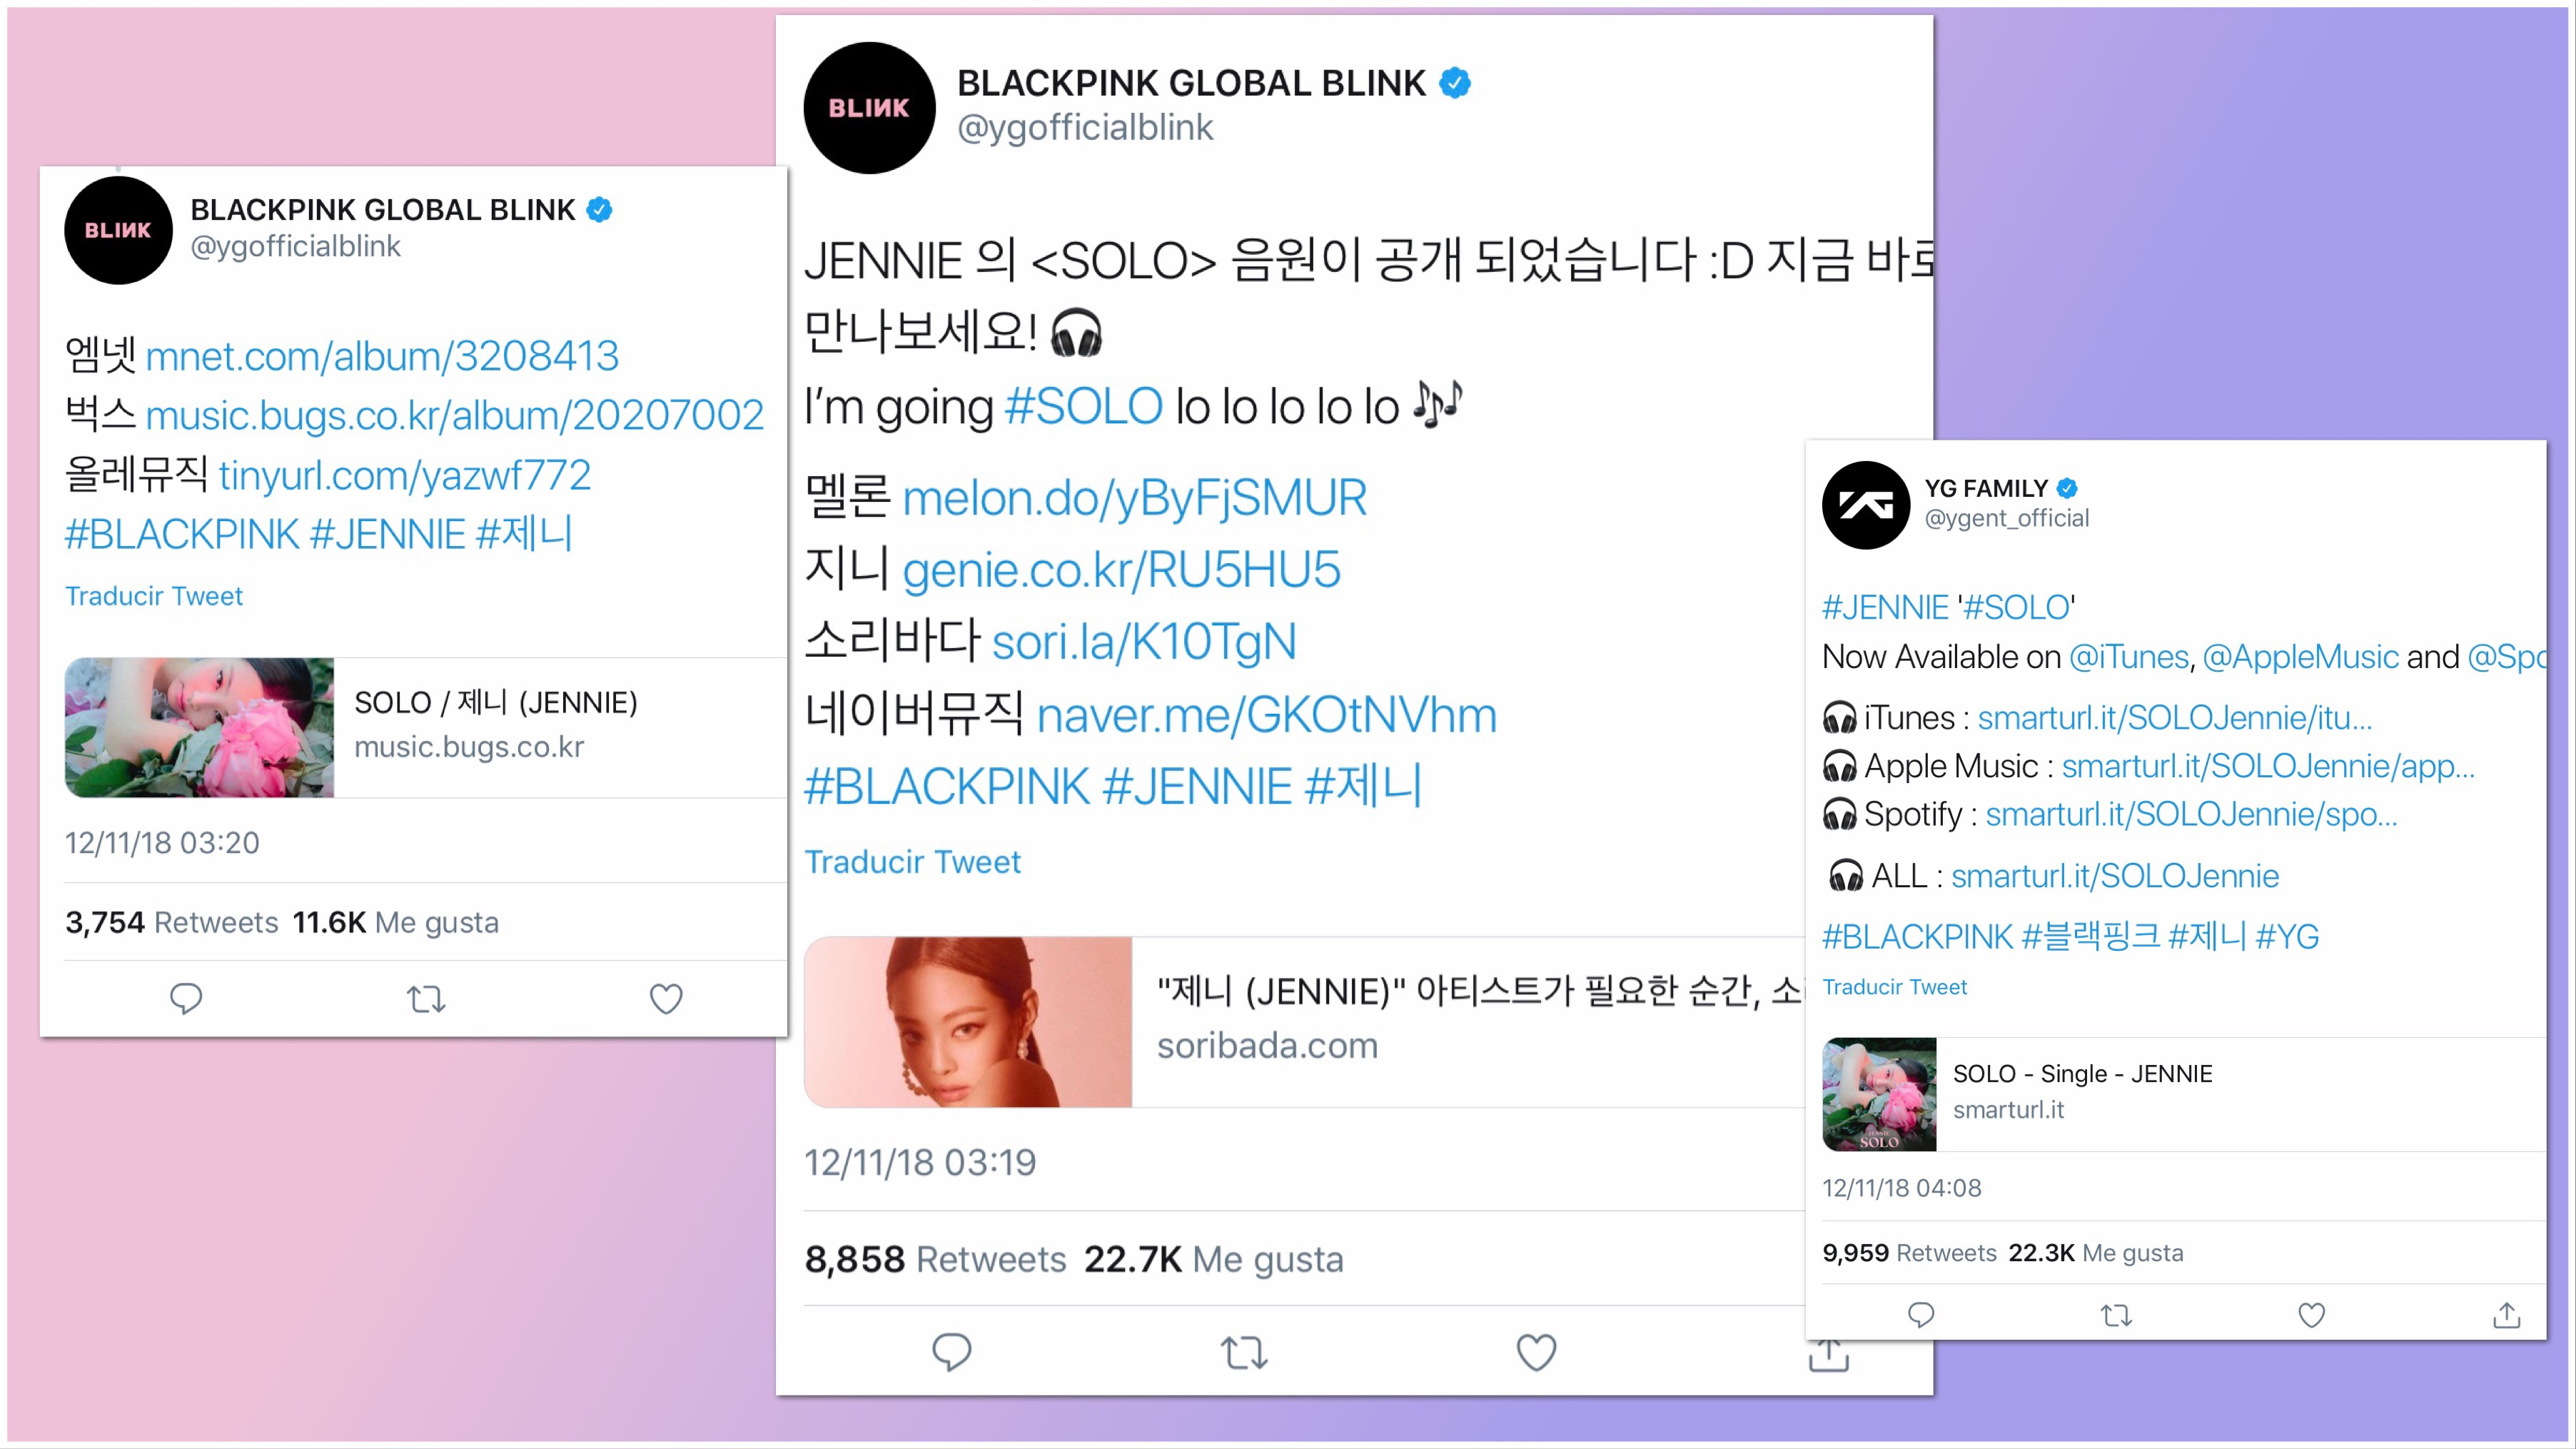 BlackPink Jennie, Solo, tuits